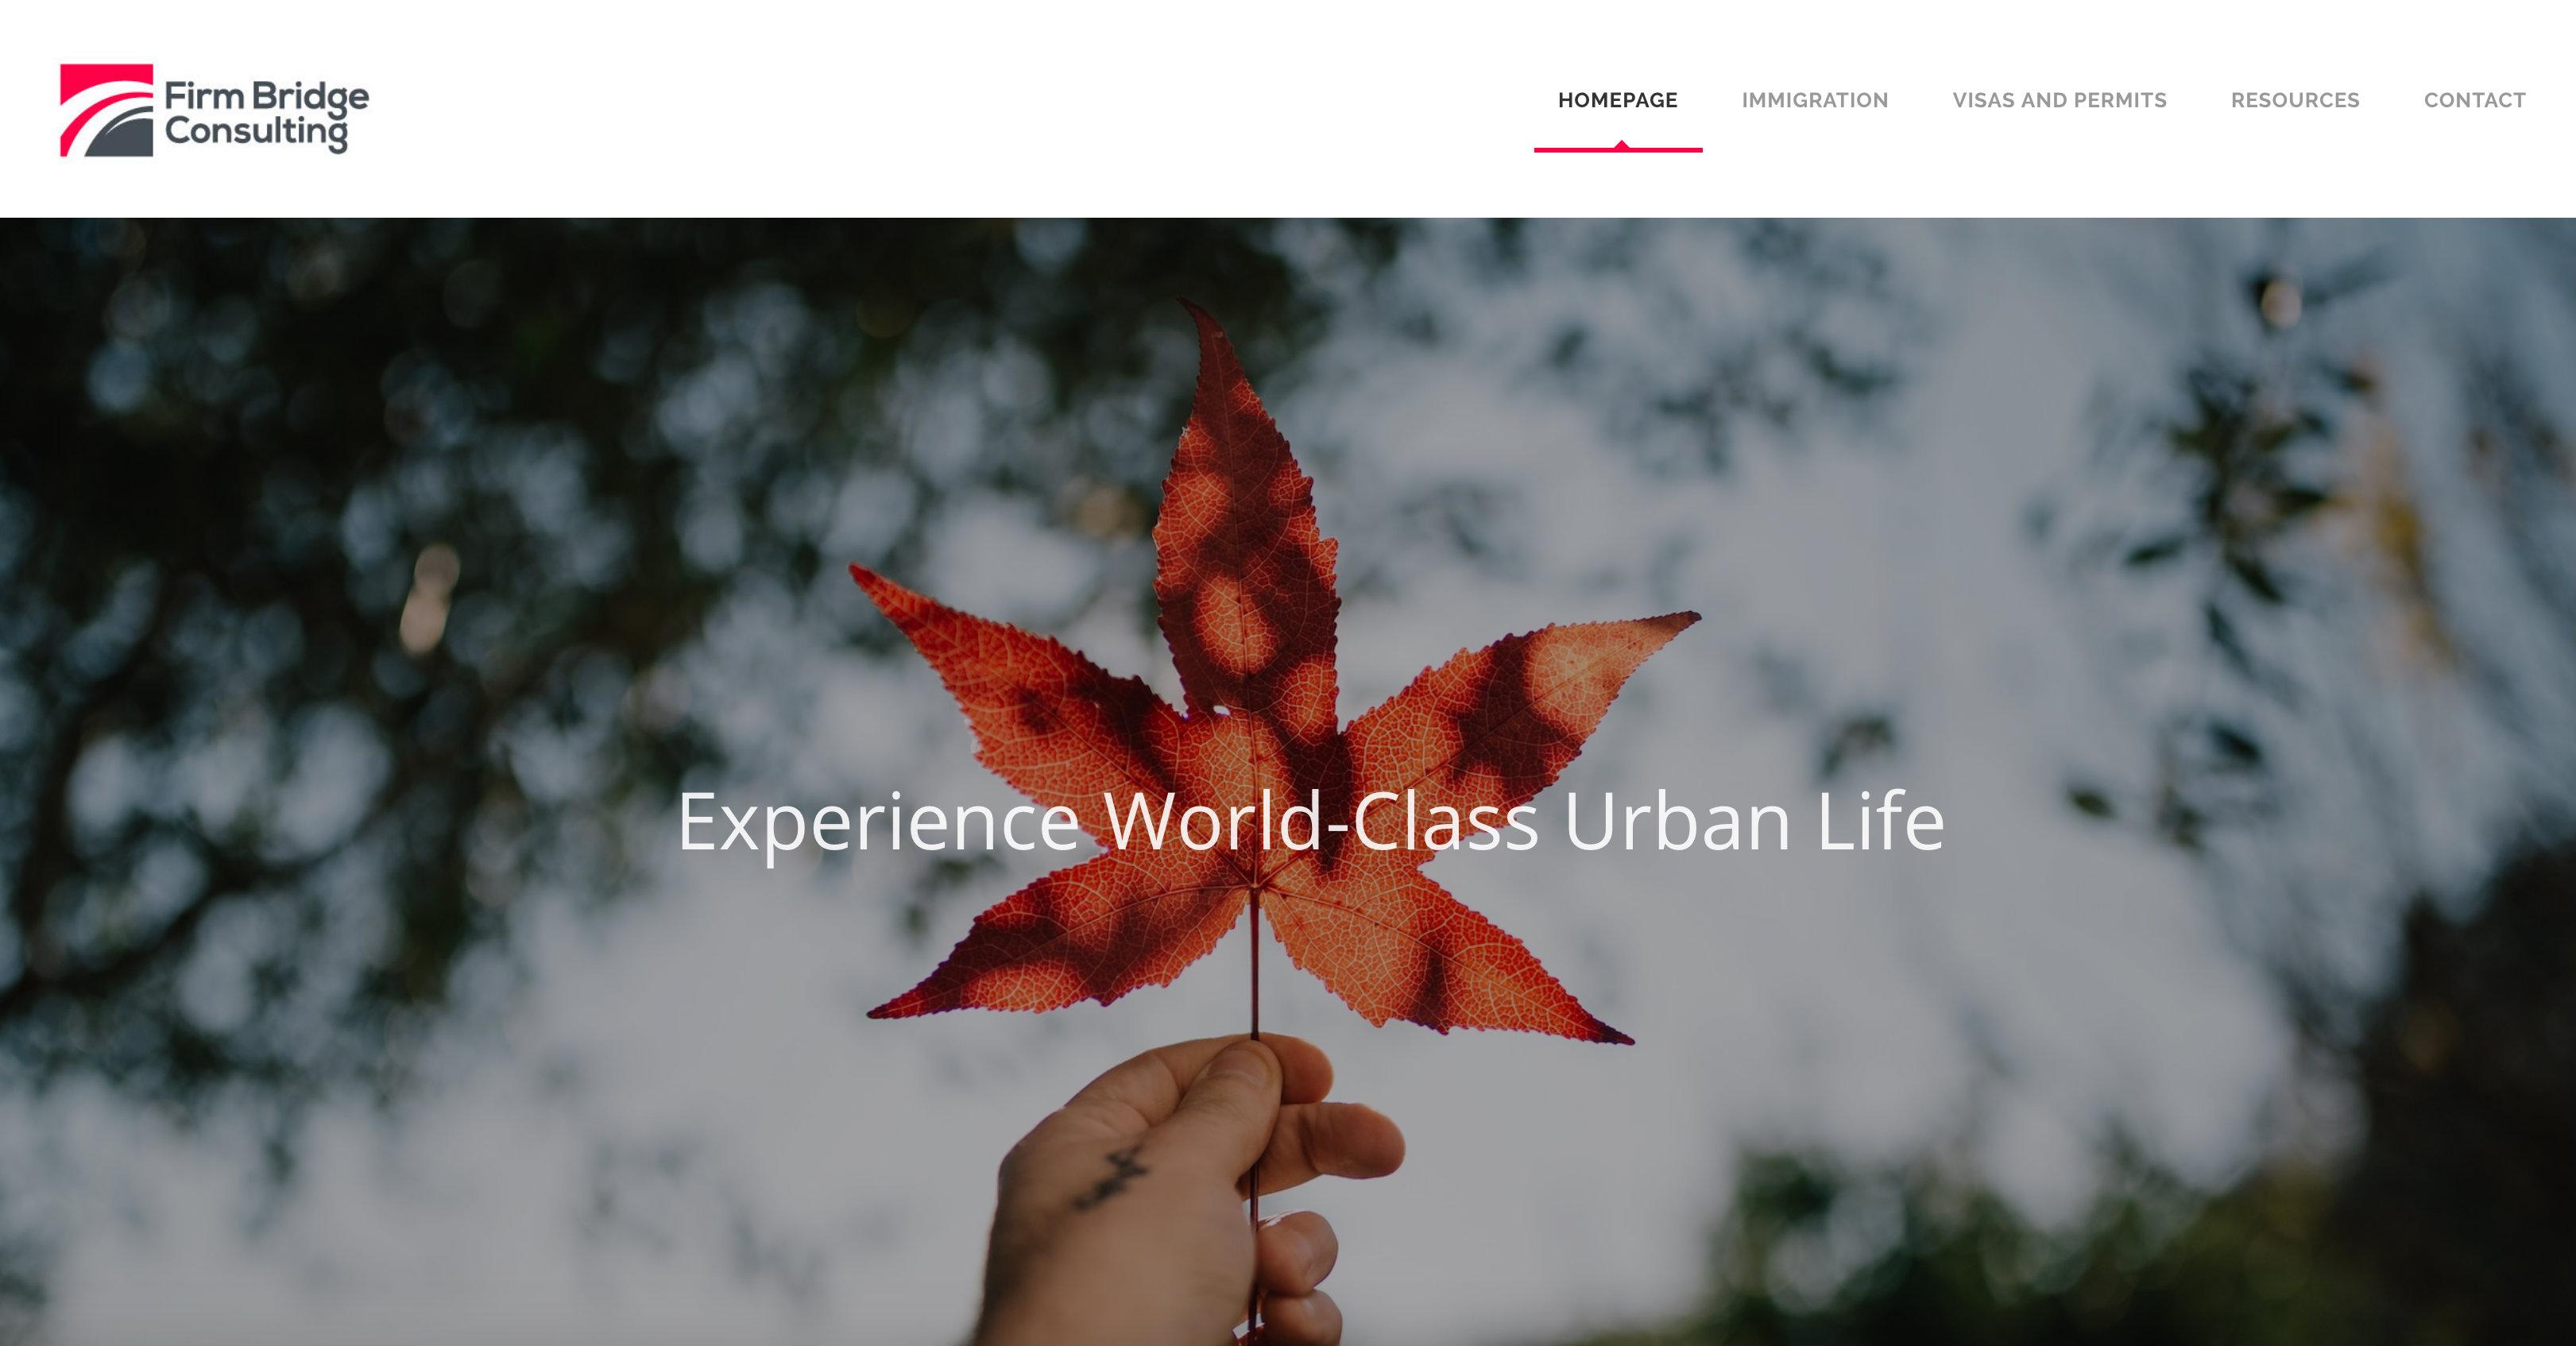 Immigration Services - Firm Bridge - Hilborn Digital Website Design